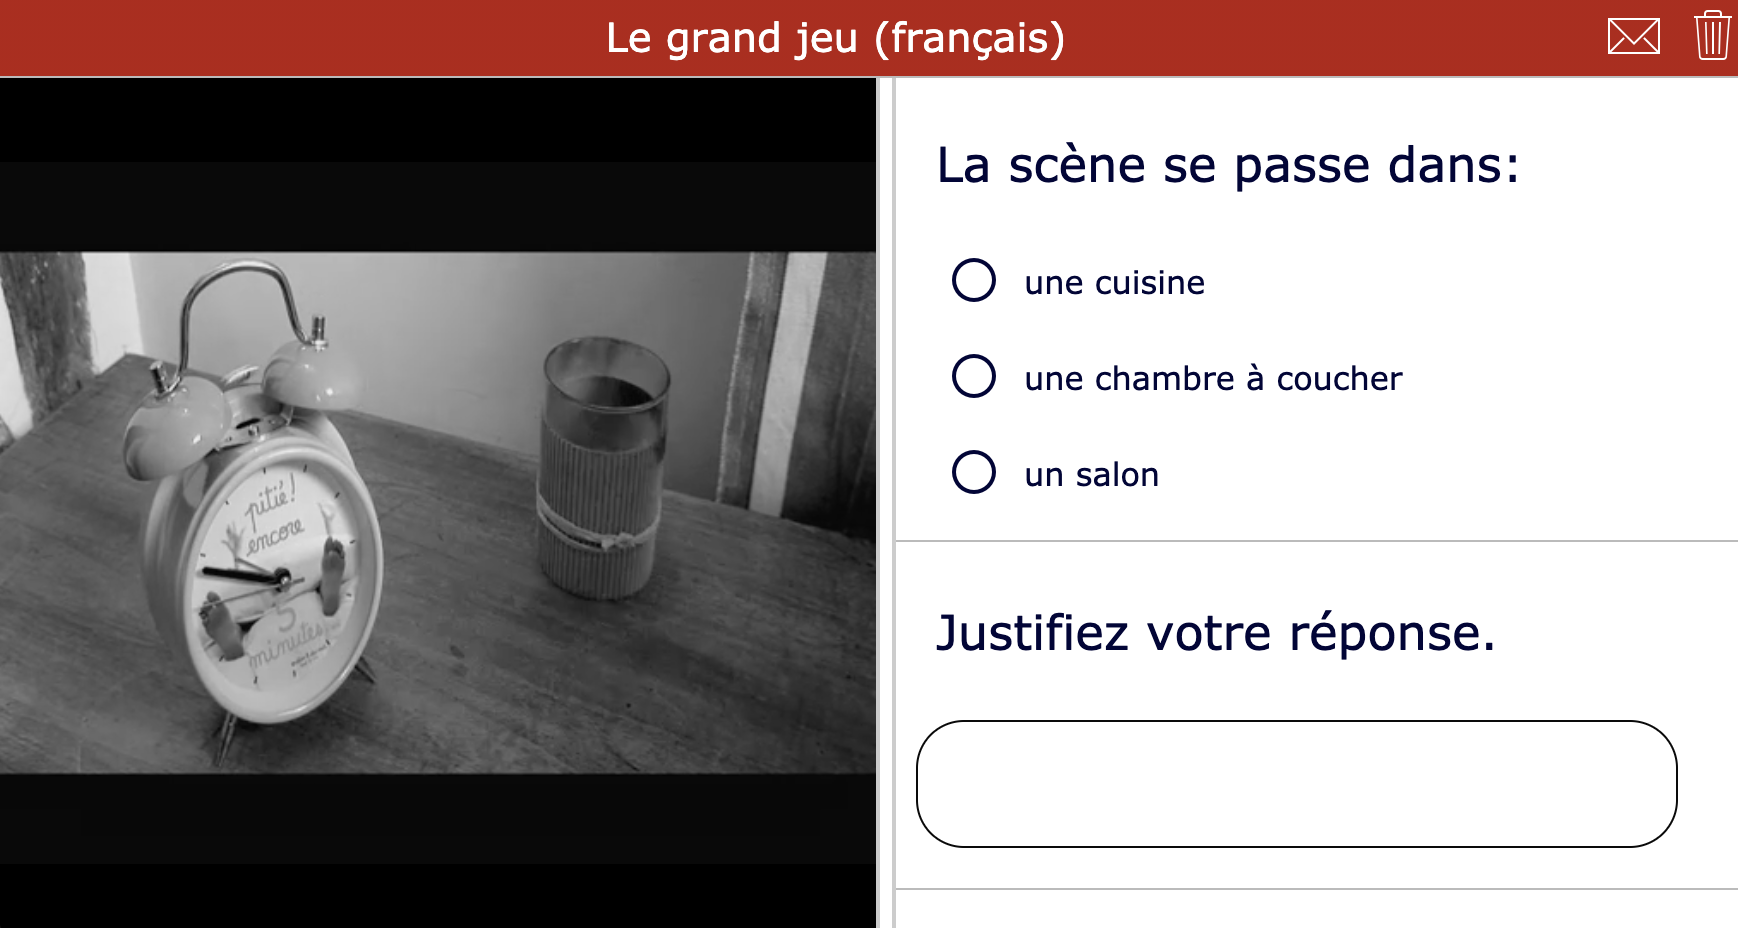 Short films - Le grand jeu - rench listening comprehension